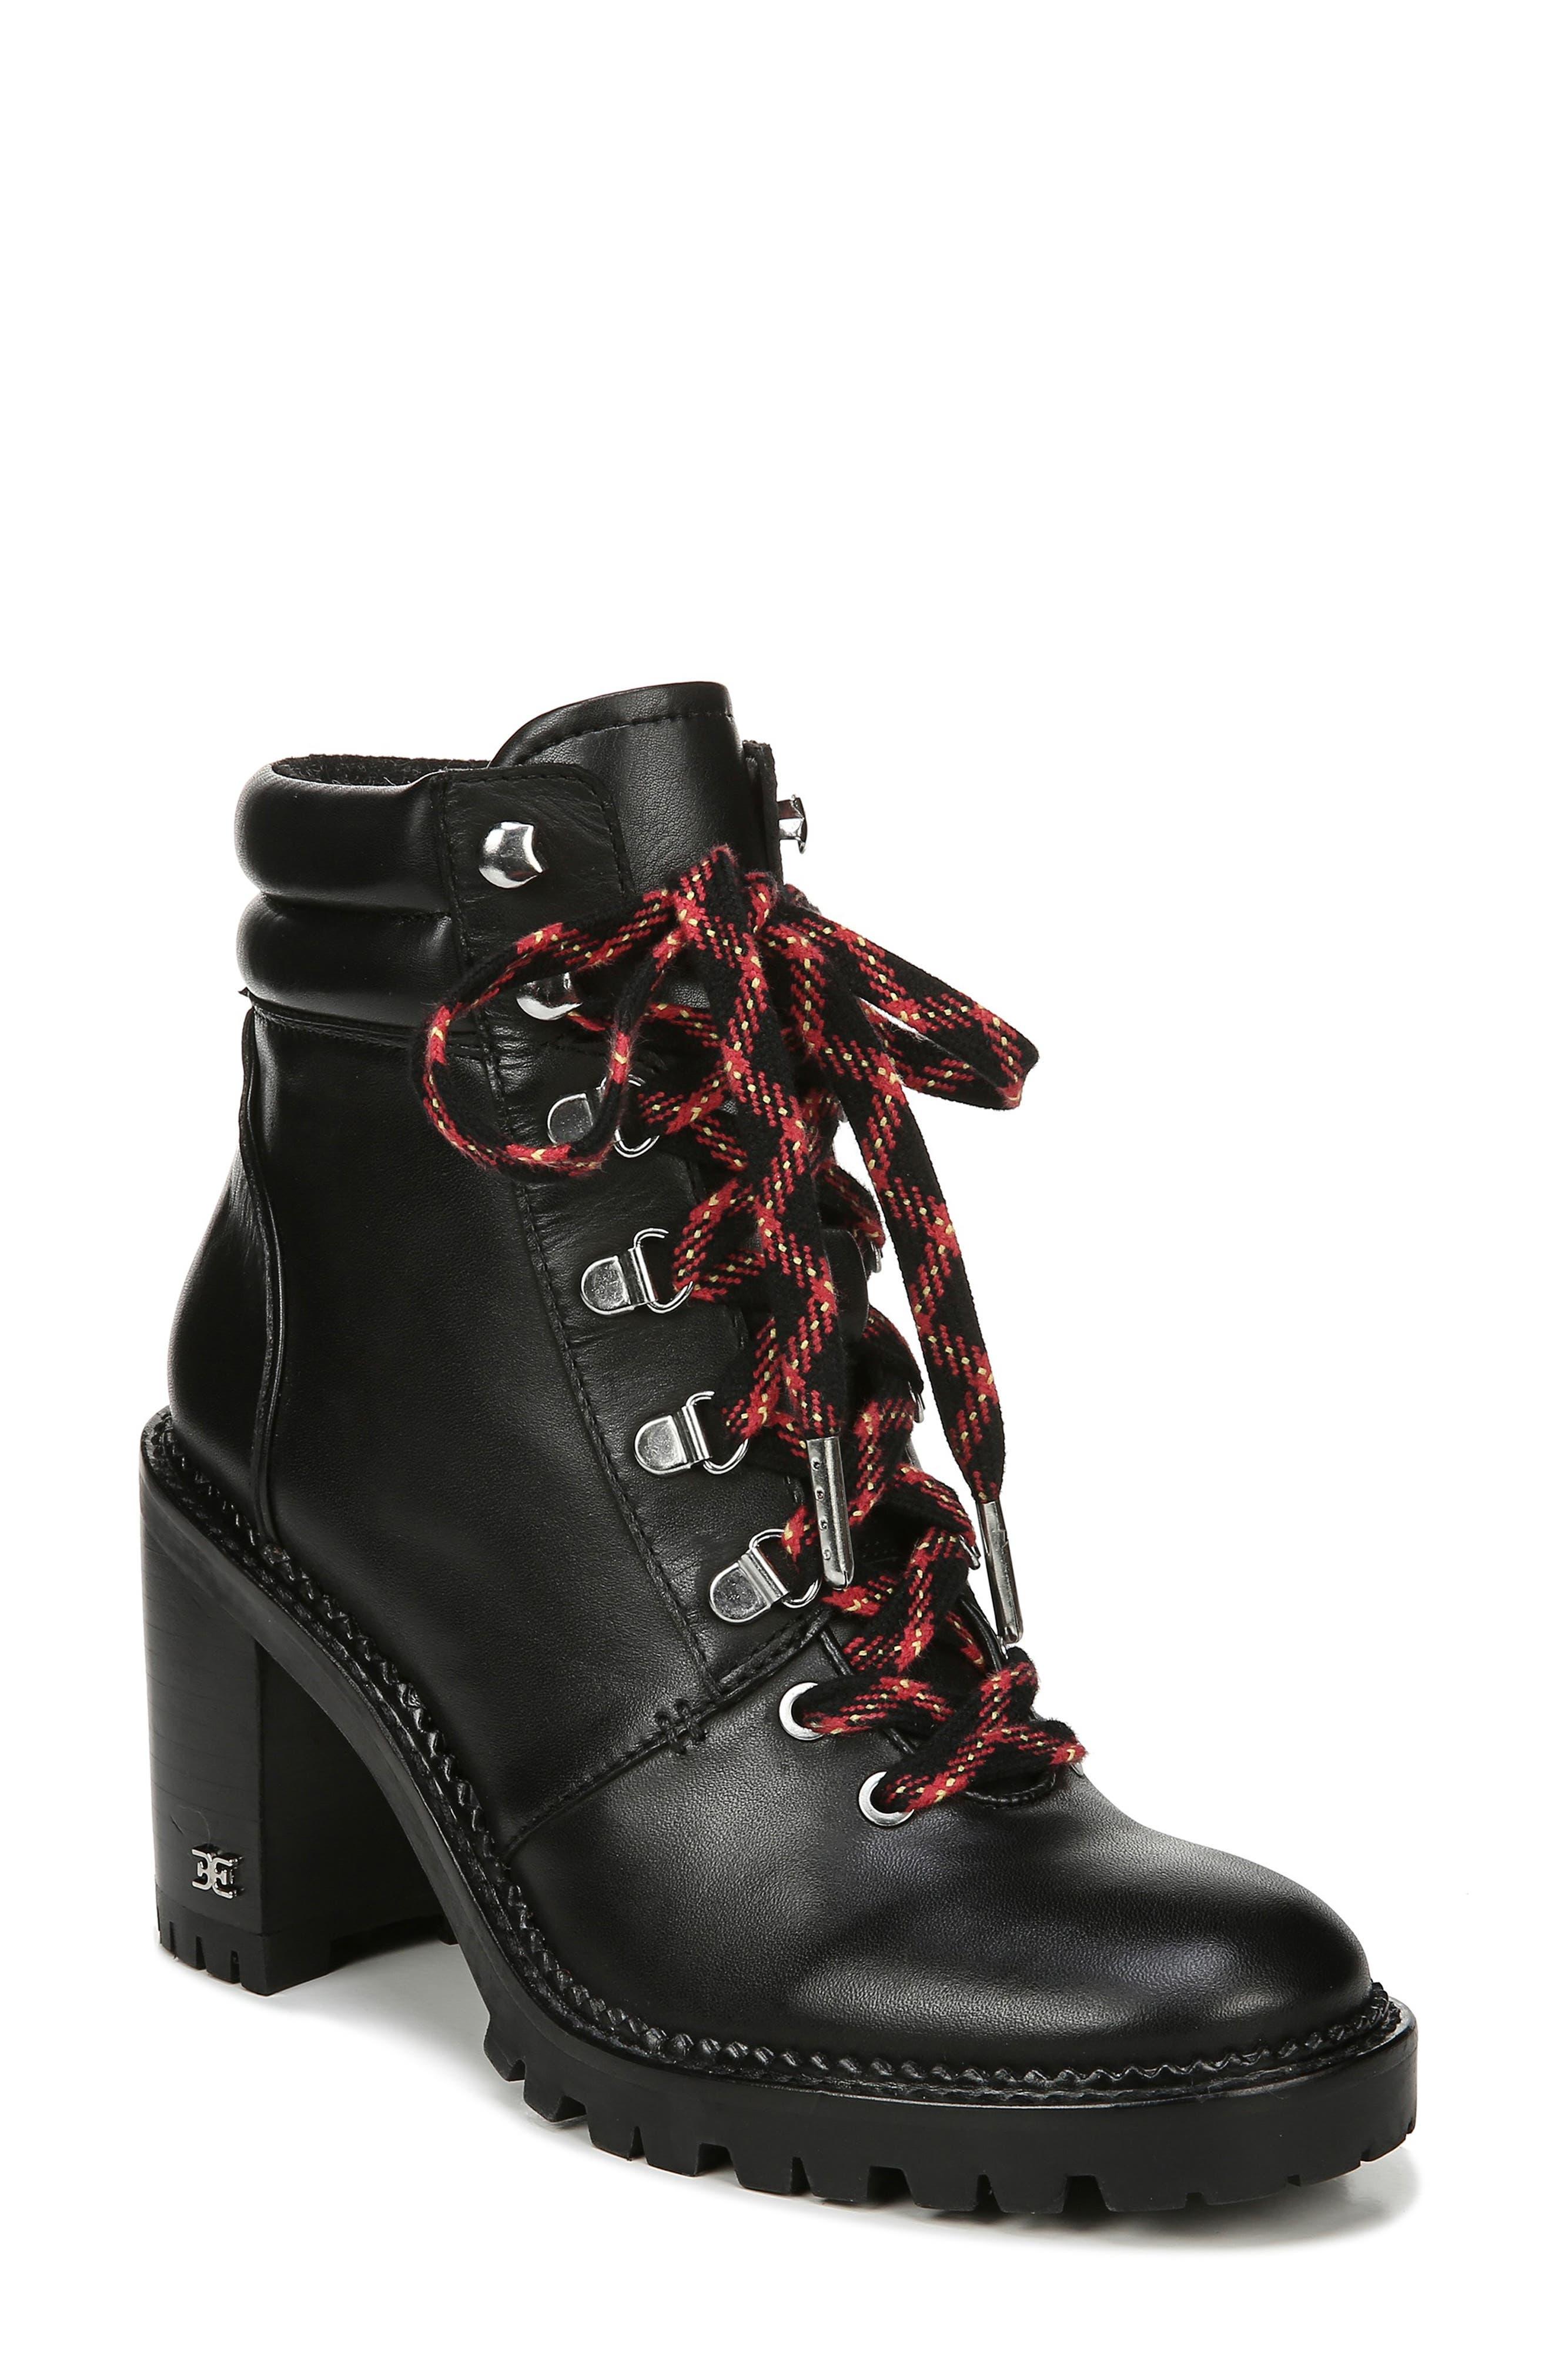 Sam Edelman Boots Sade Lace-Up Boot